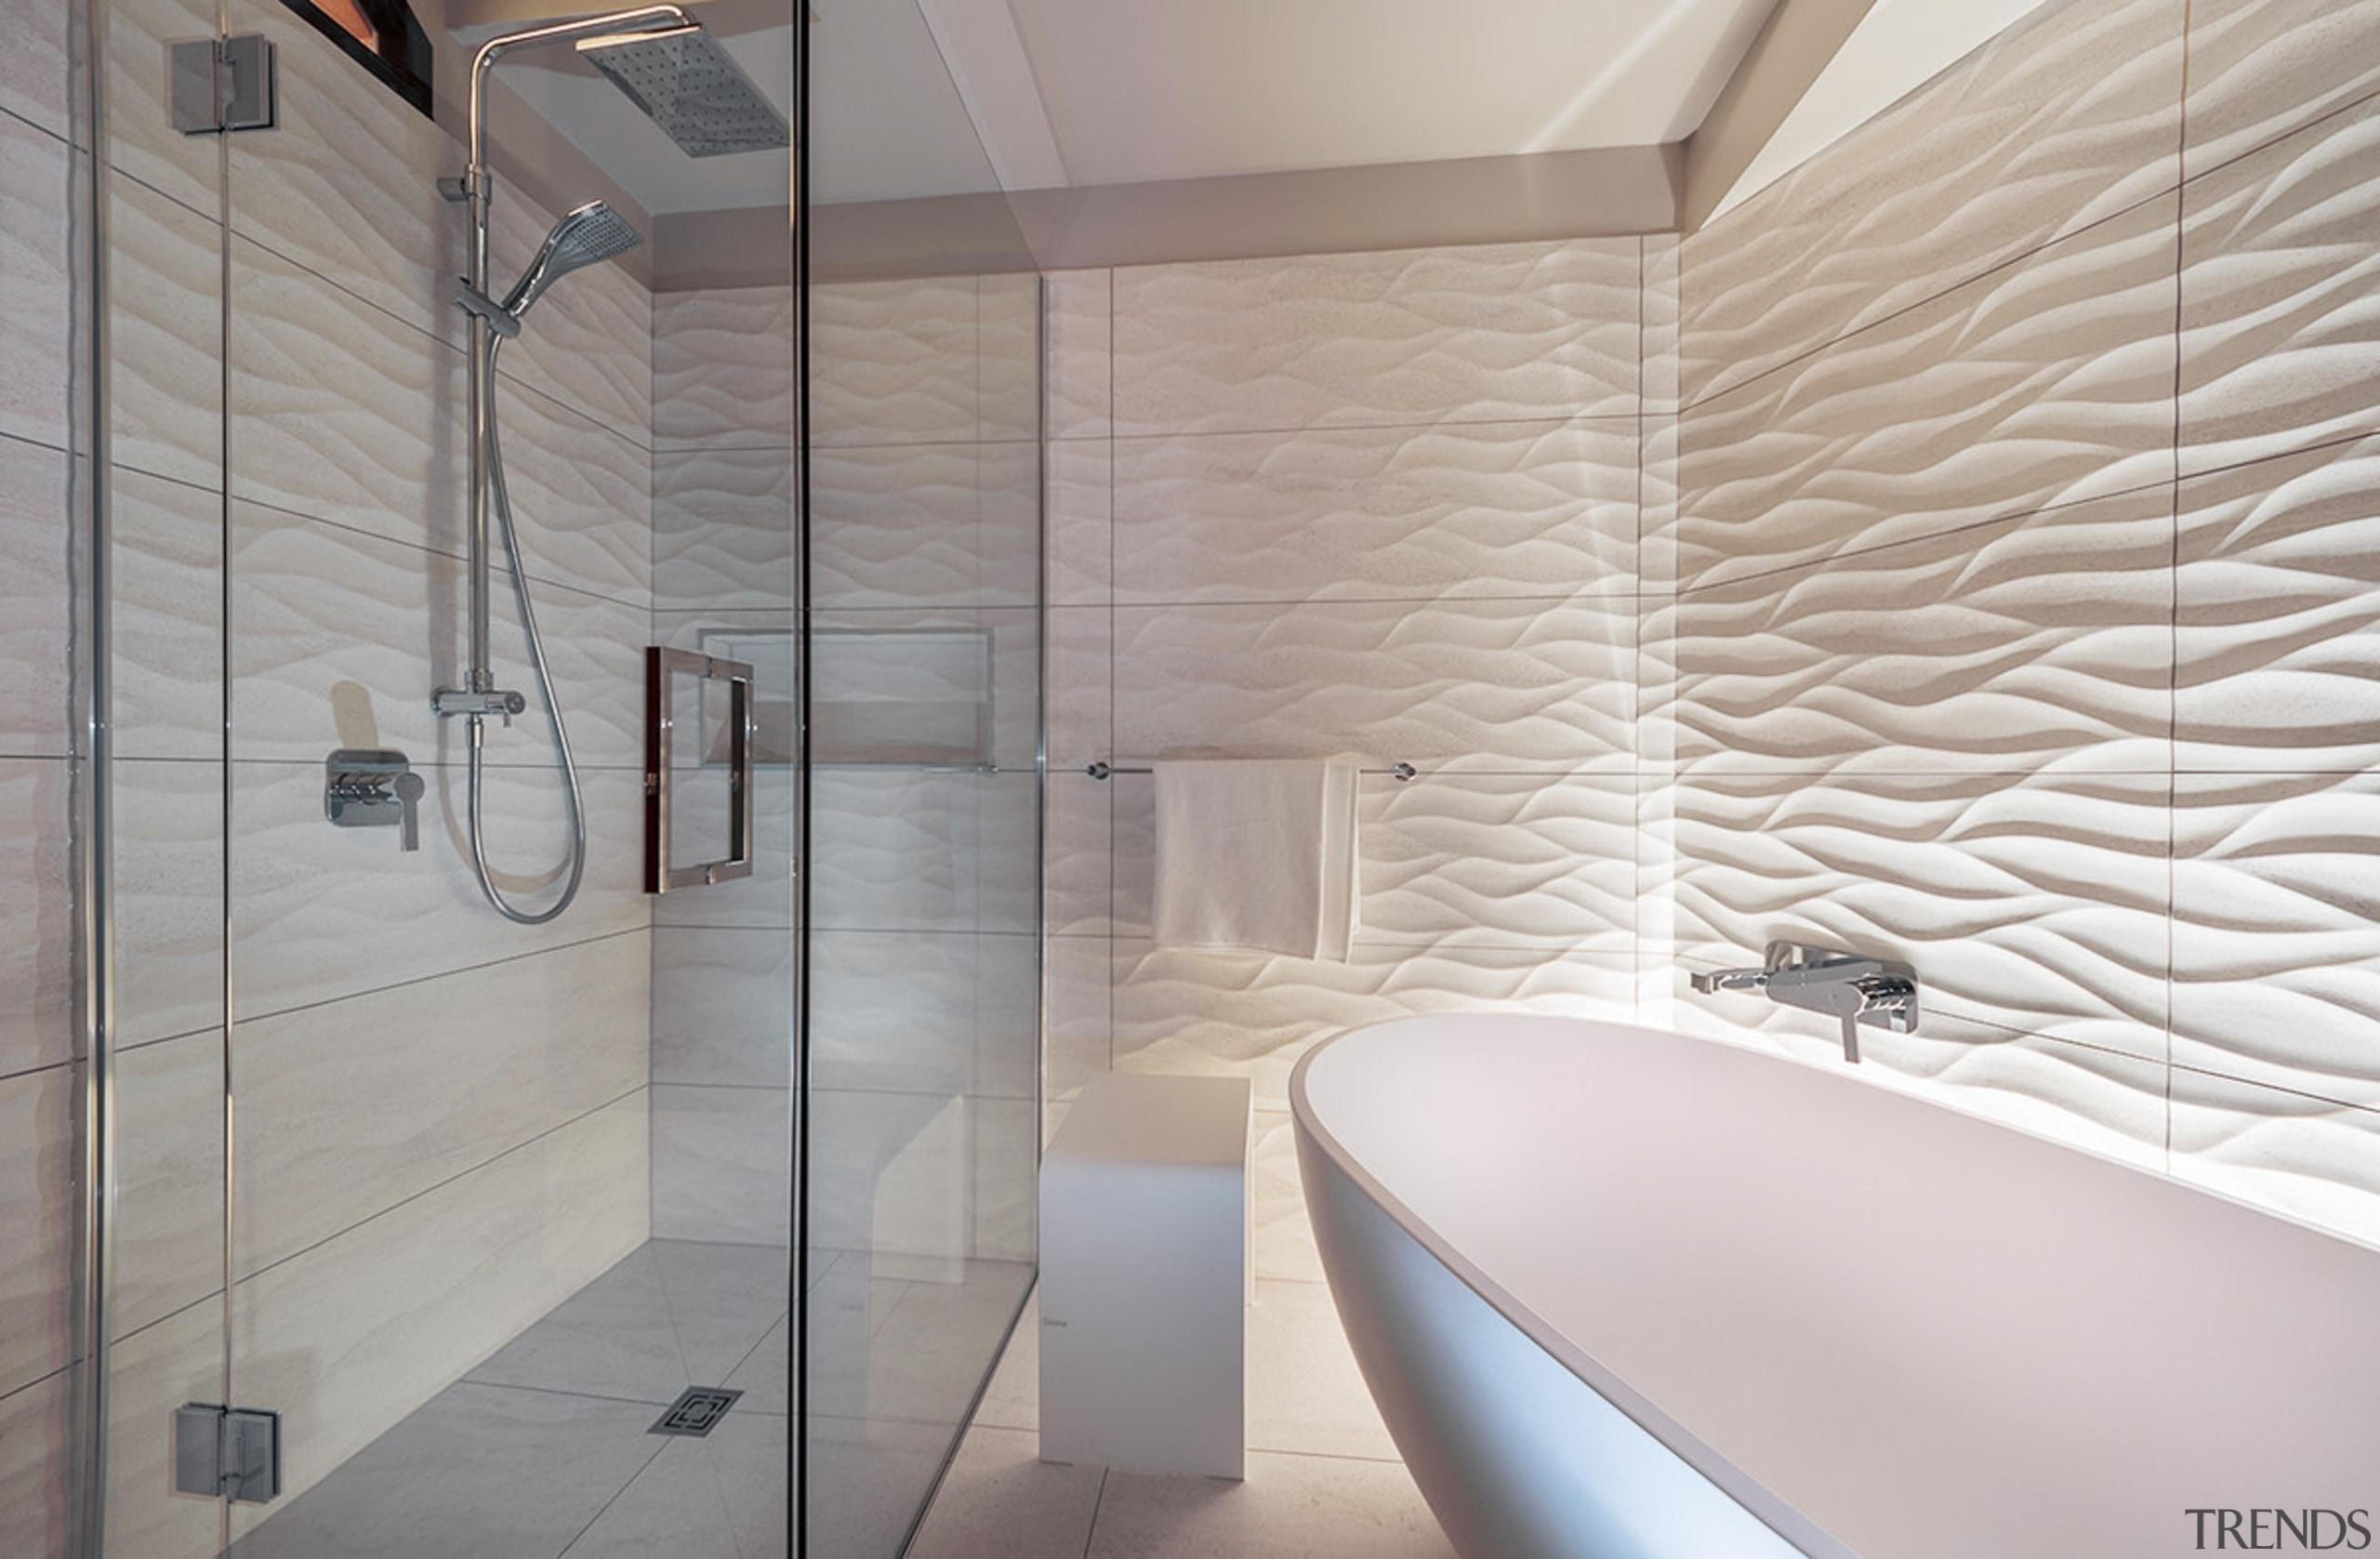 Distinctive 3D wave-pattern tiles running behind the tub architecture, bathroom, ceiling, floor, flooring, interior design, room, tile, wall, gray